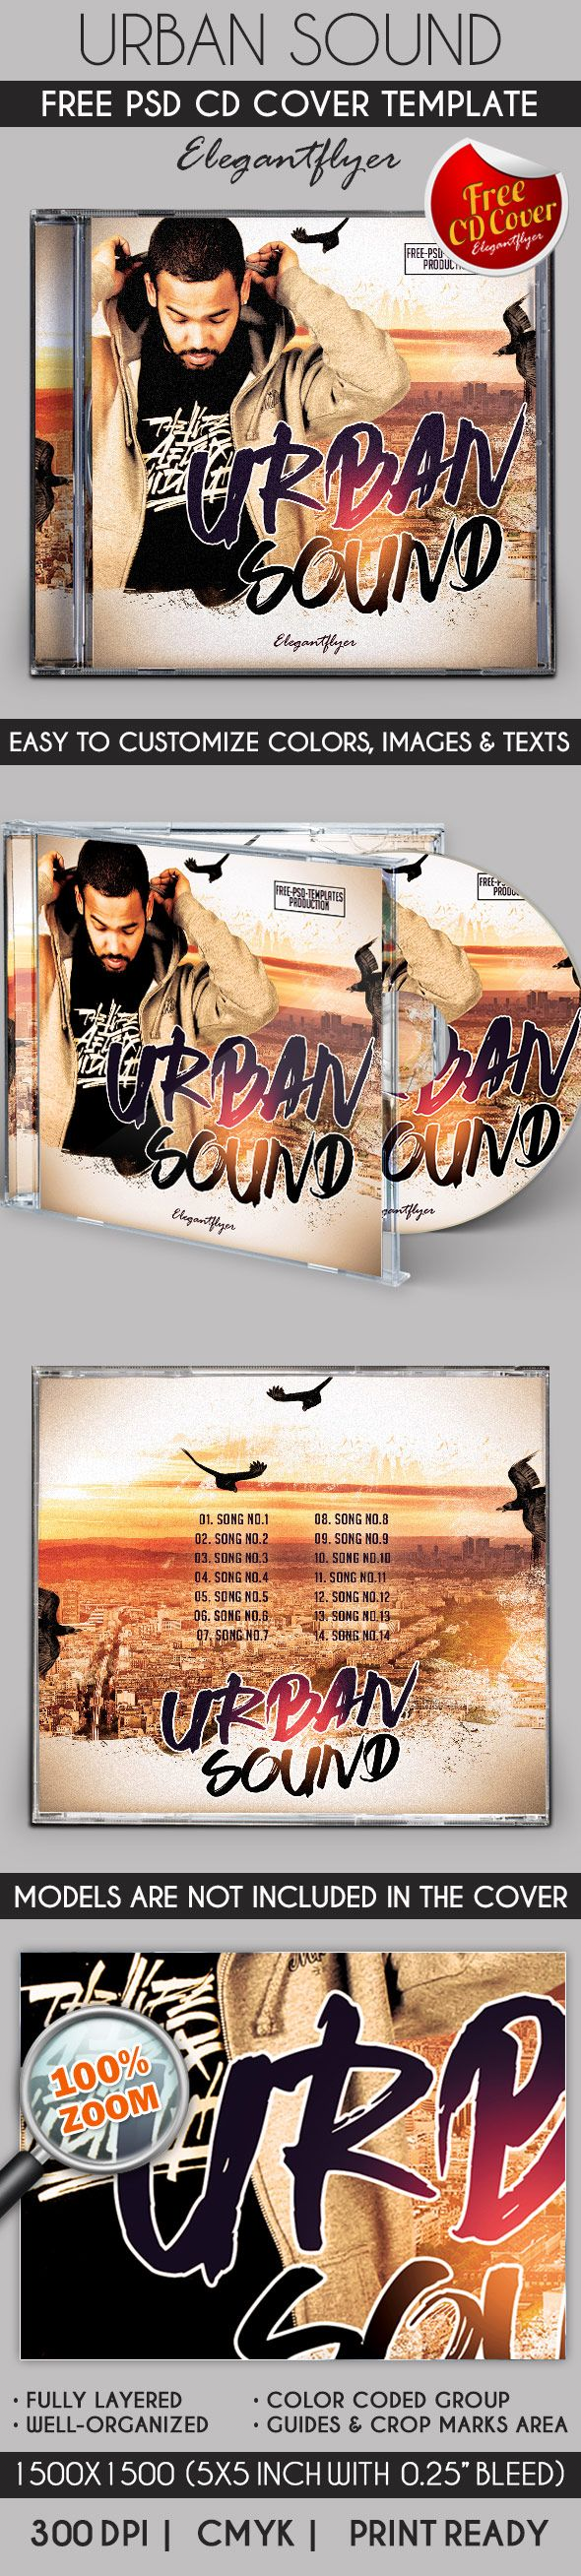 Urban Sound – Free CD Cover PSD Template https://www.elegantflyer.com/free-cd-dvd-templates/urban-sound-free-cd-cover-psd-template/